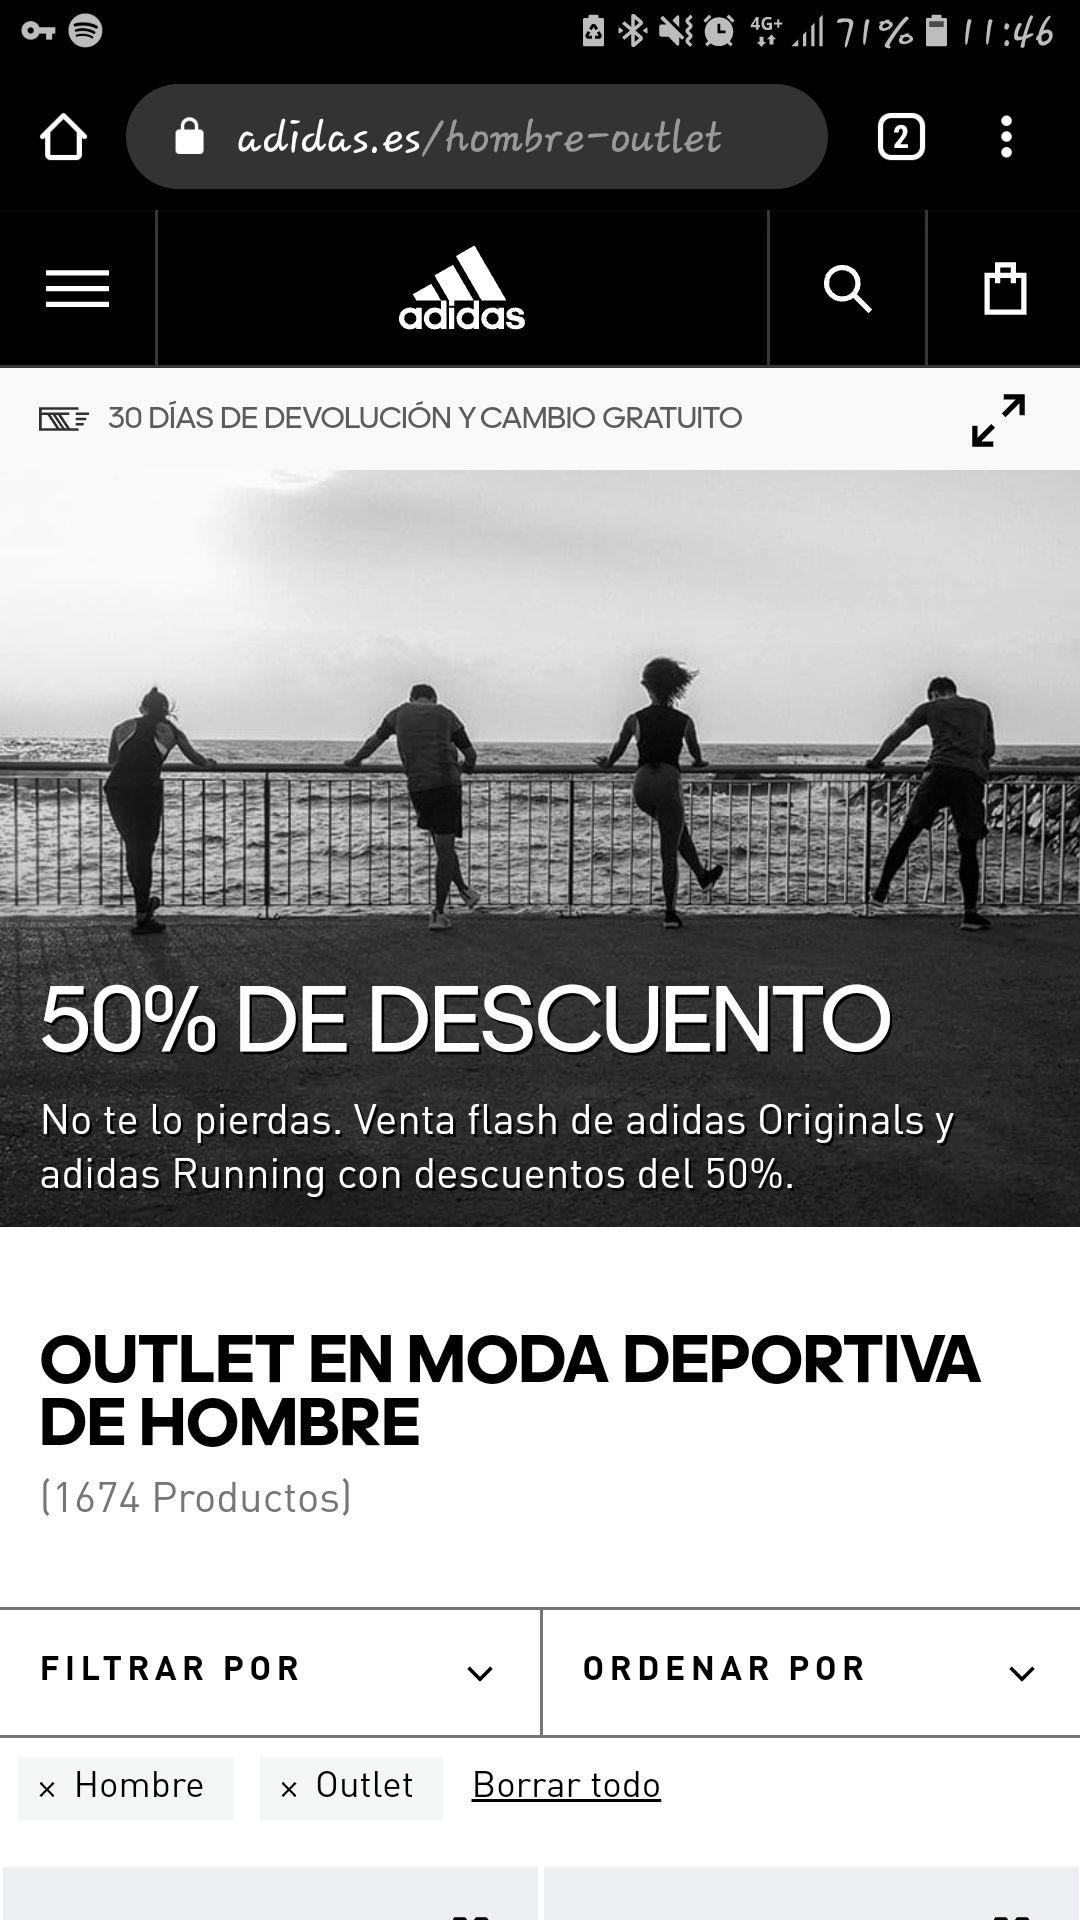 Adidas 50% venta flash